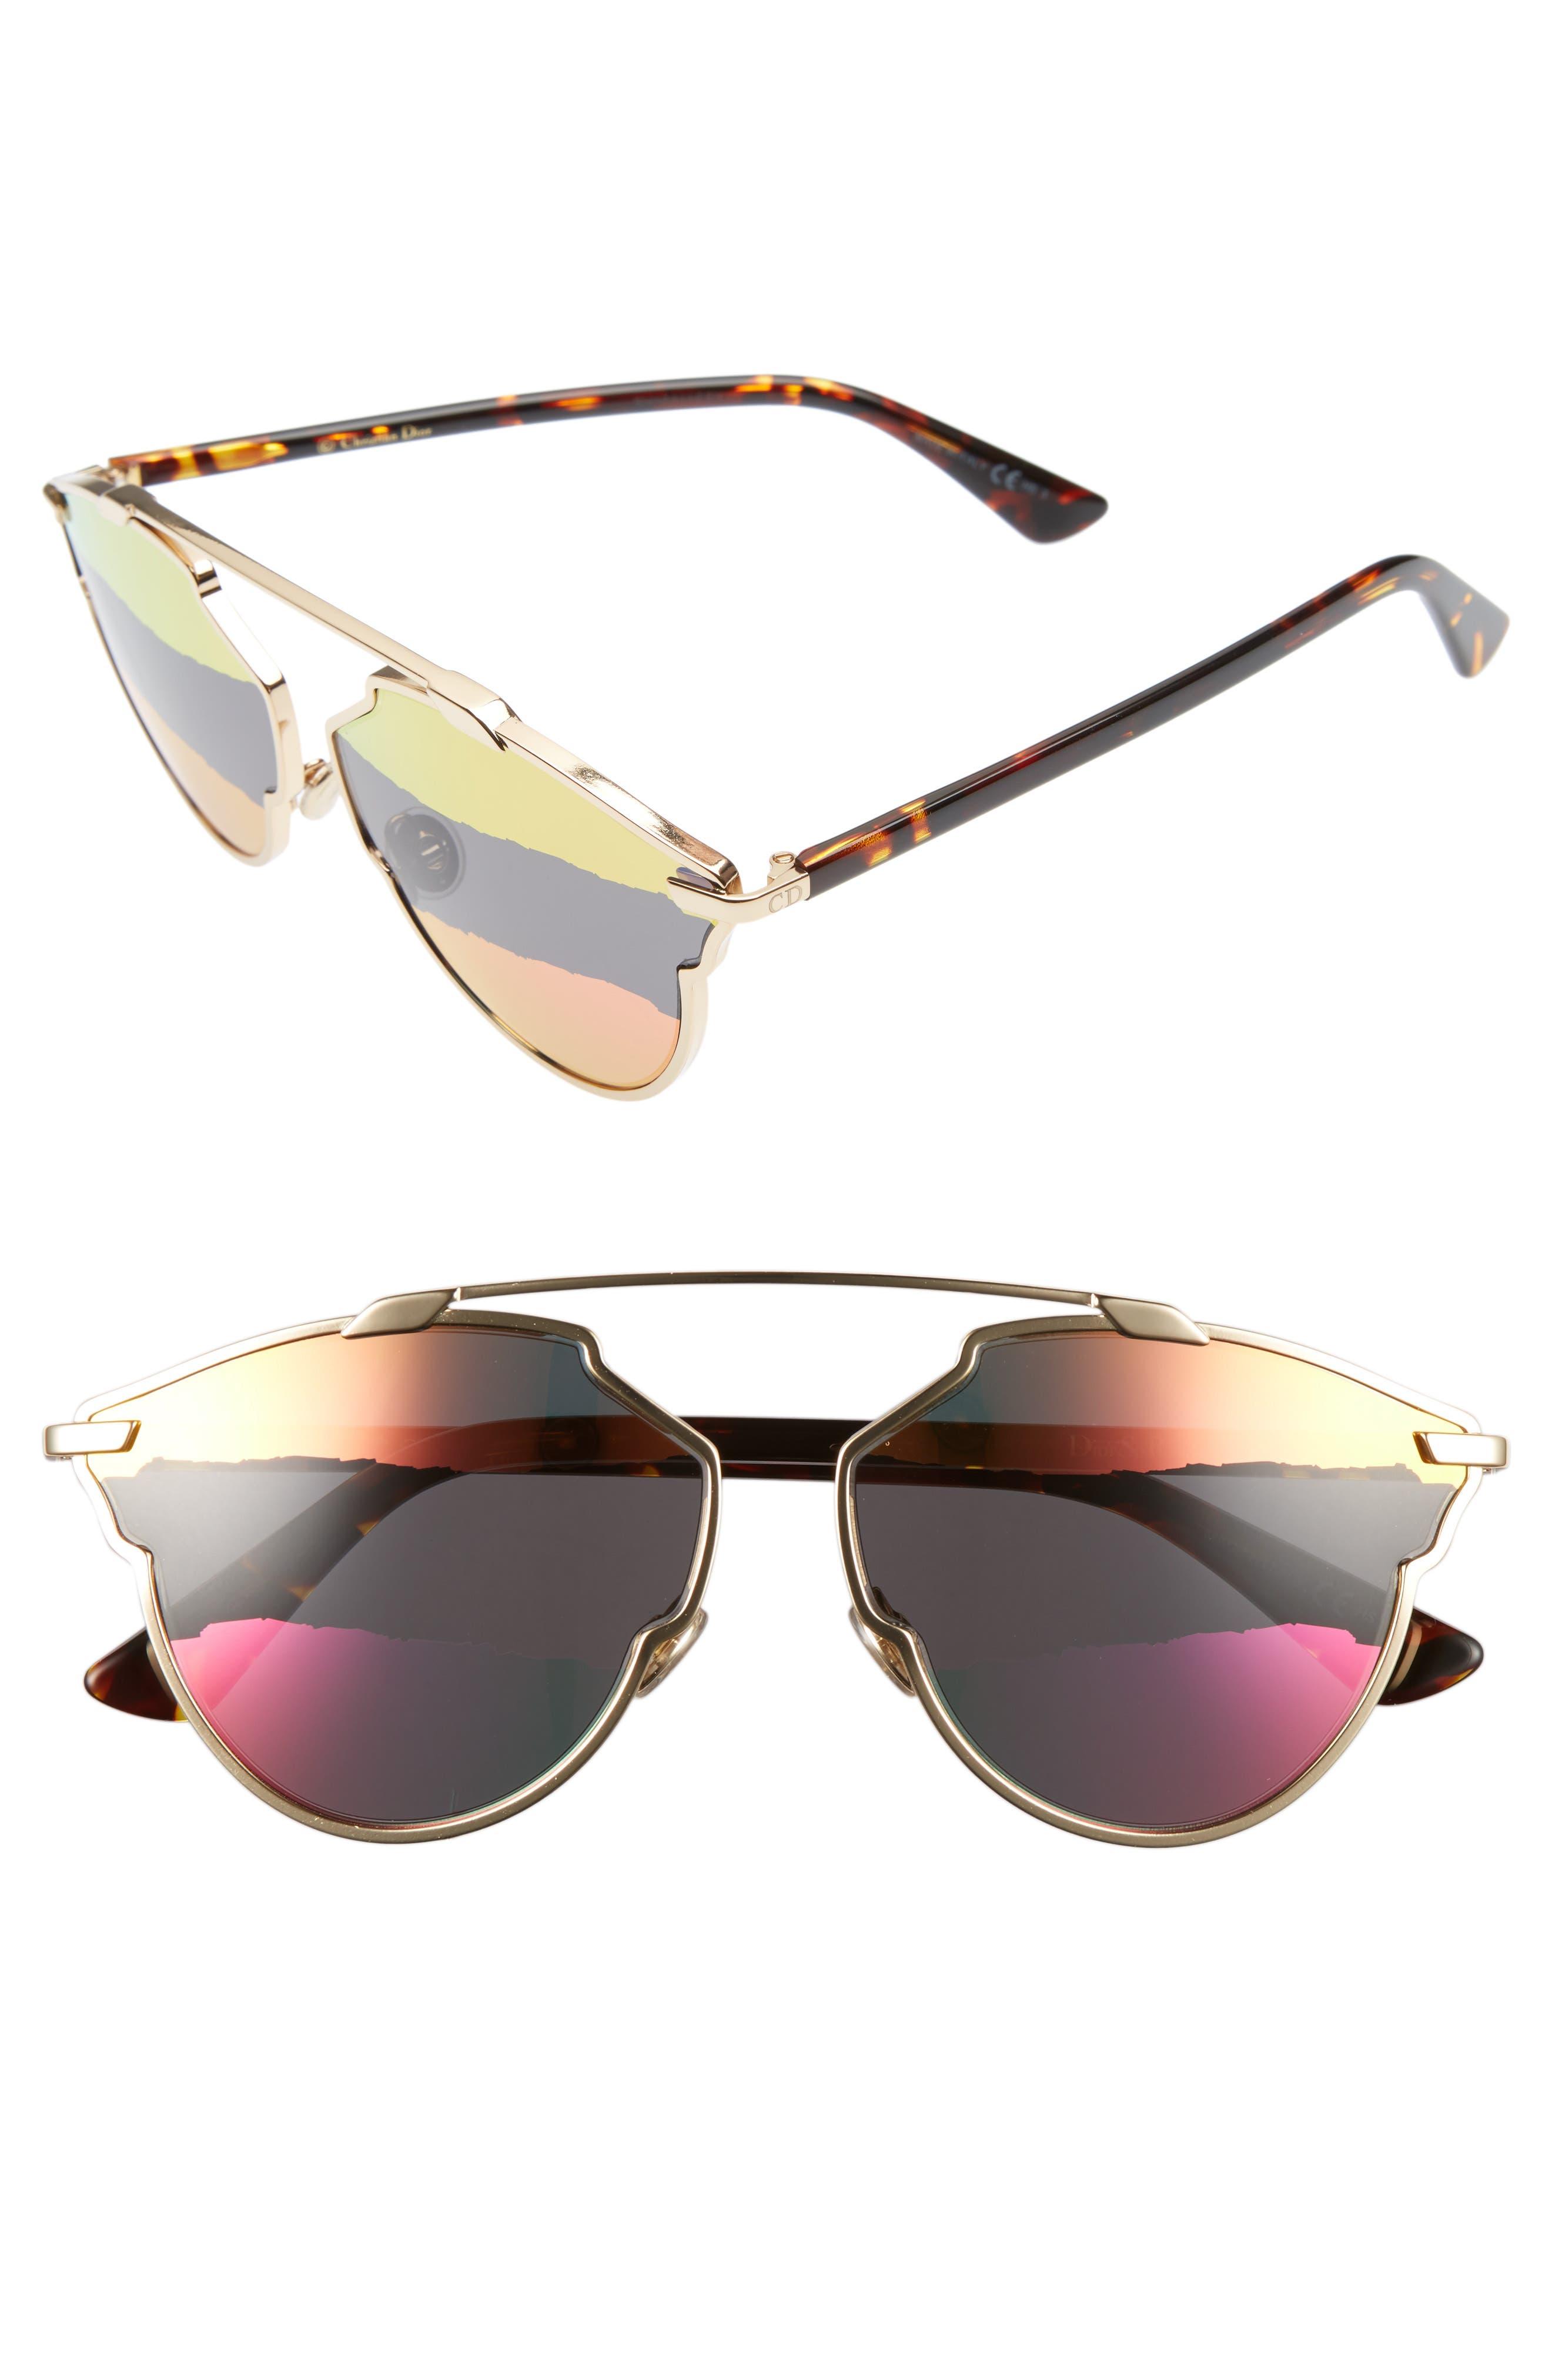 Alternate Image 1 Selected - Dior So Real 59mm Brow Bar Sunglasses